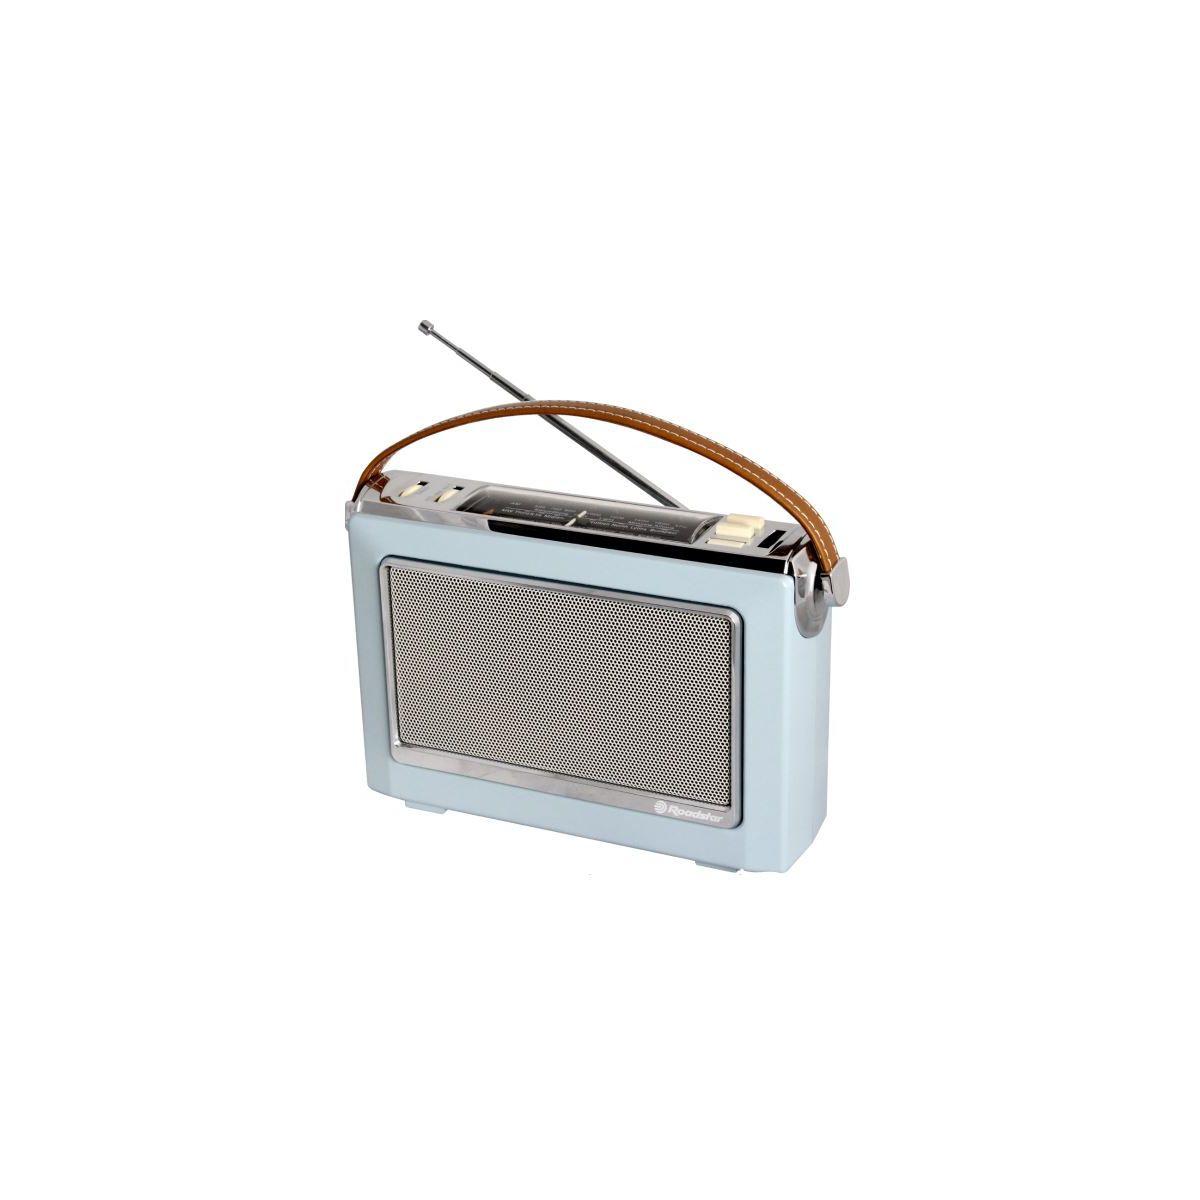 Radio analogique ROADSTAR TRA-1966/LB